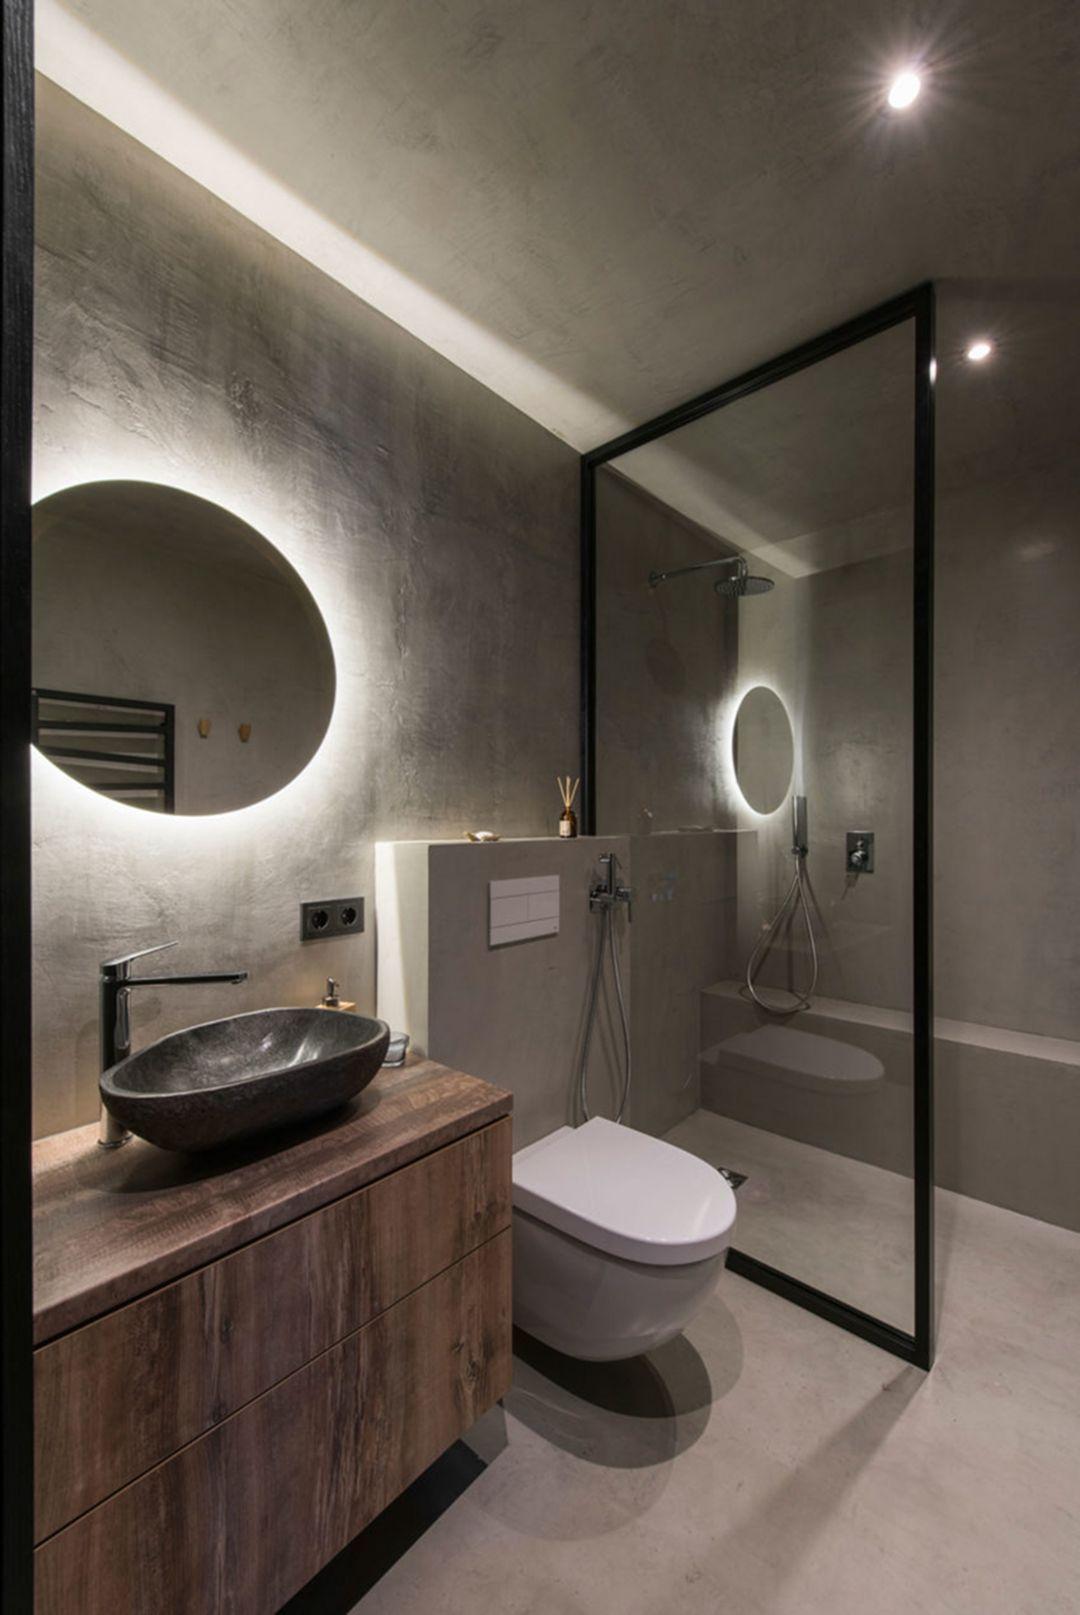 30 Incredible Industrial Bathroom Design And Decoration Ideas Industrial Style Bathroom Industrial Bathroom Decor Industrial Bathroom Design